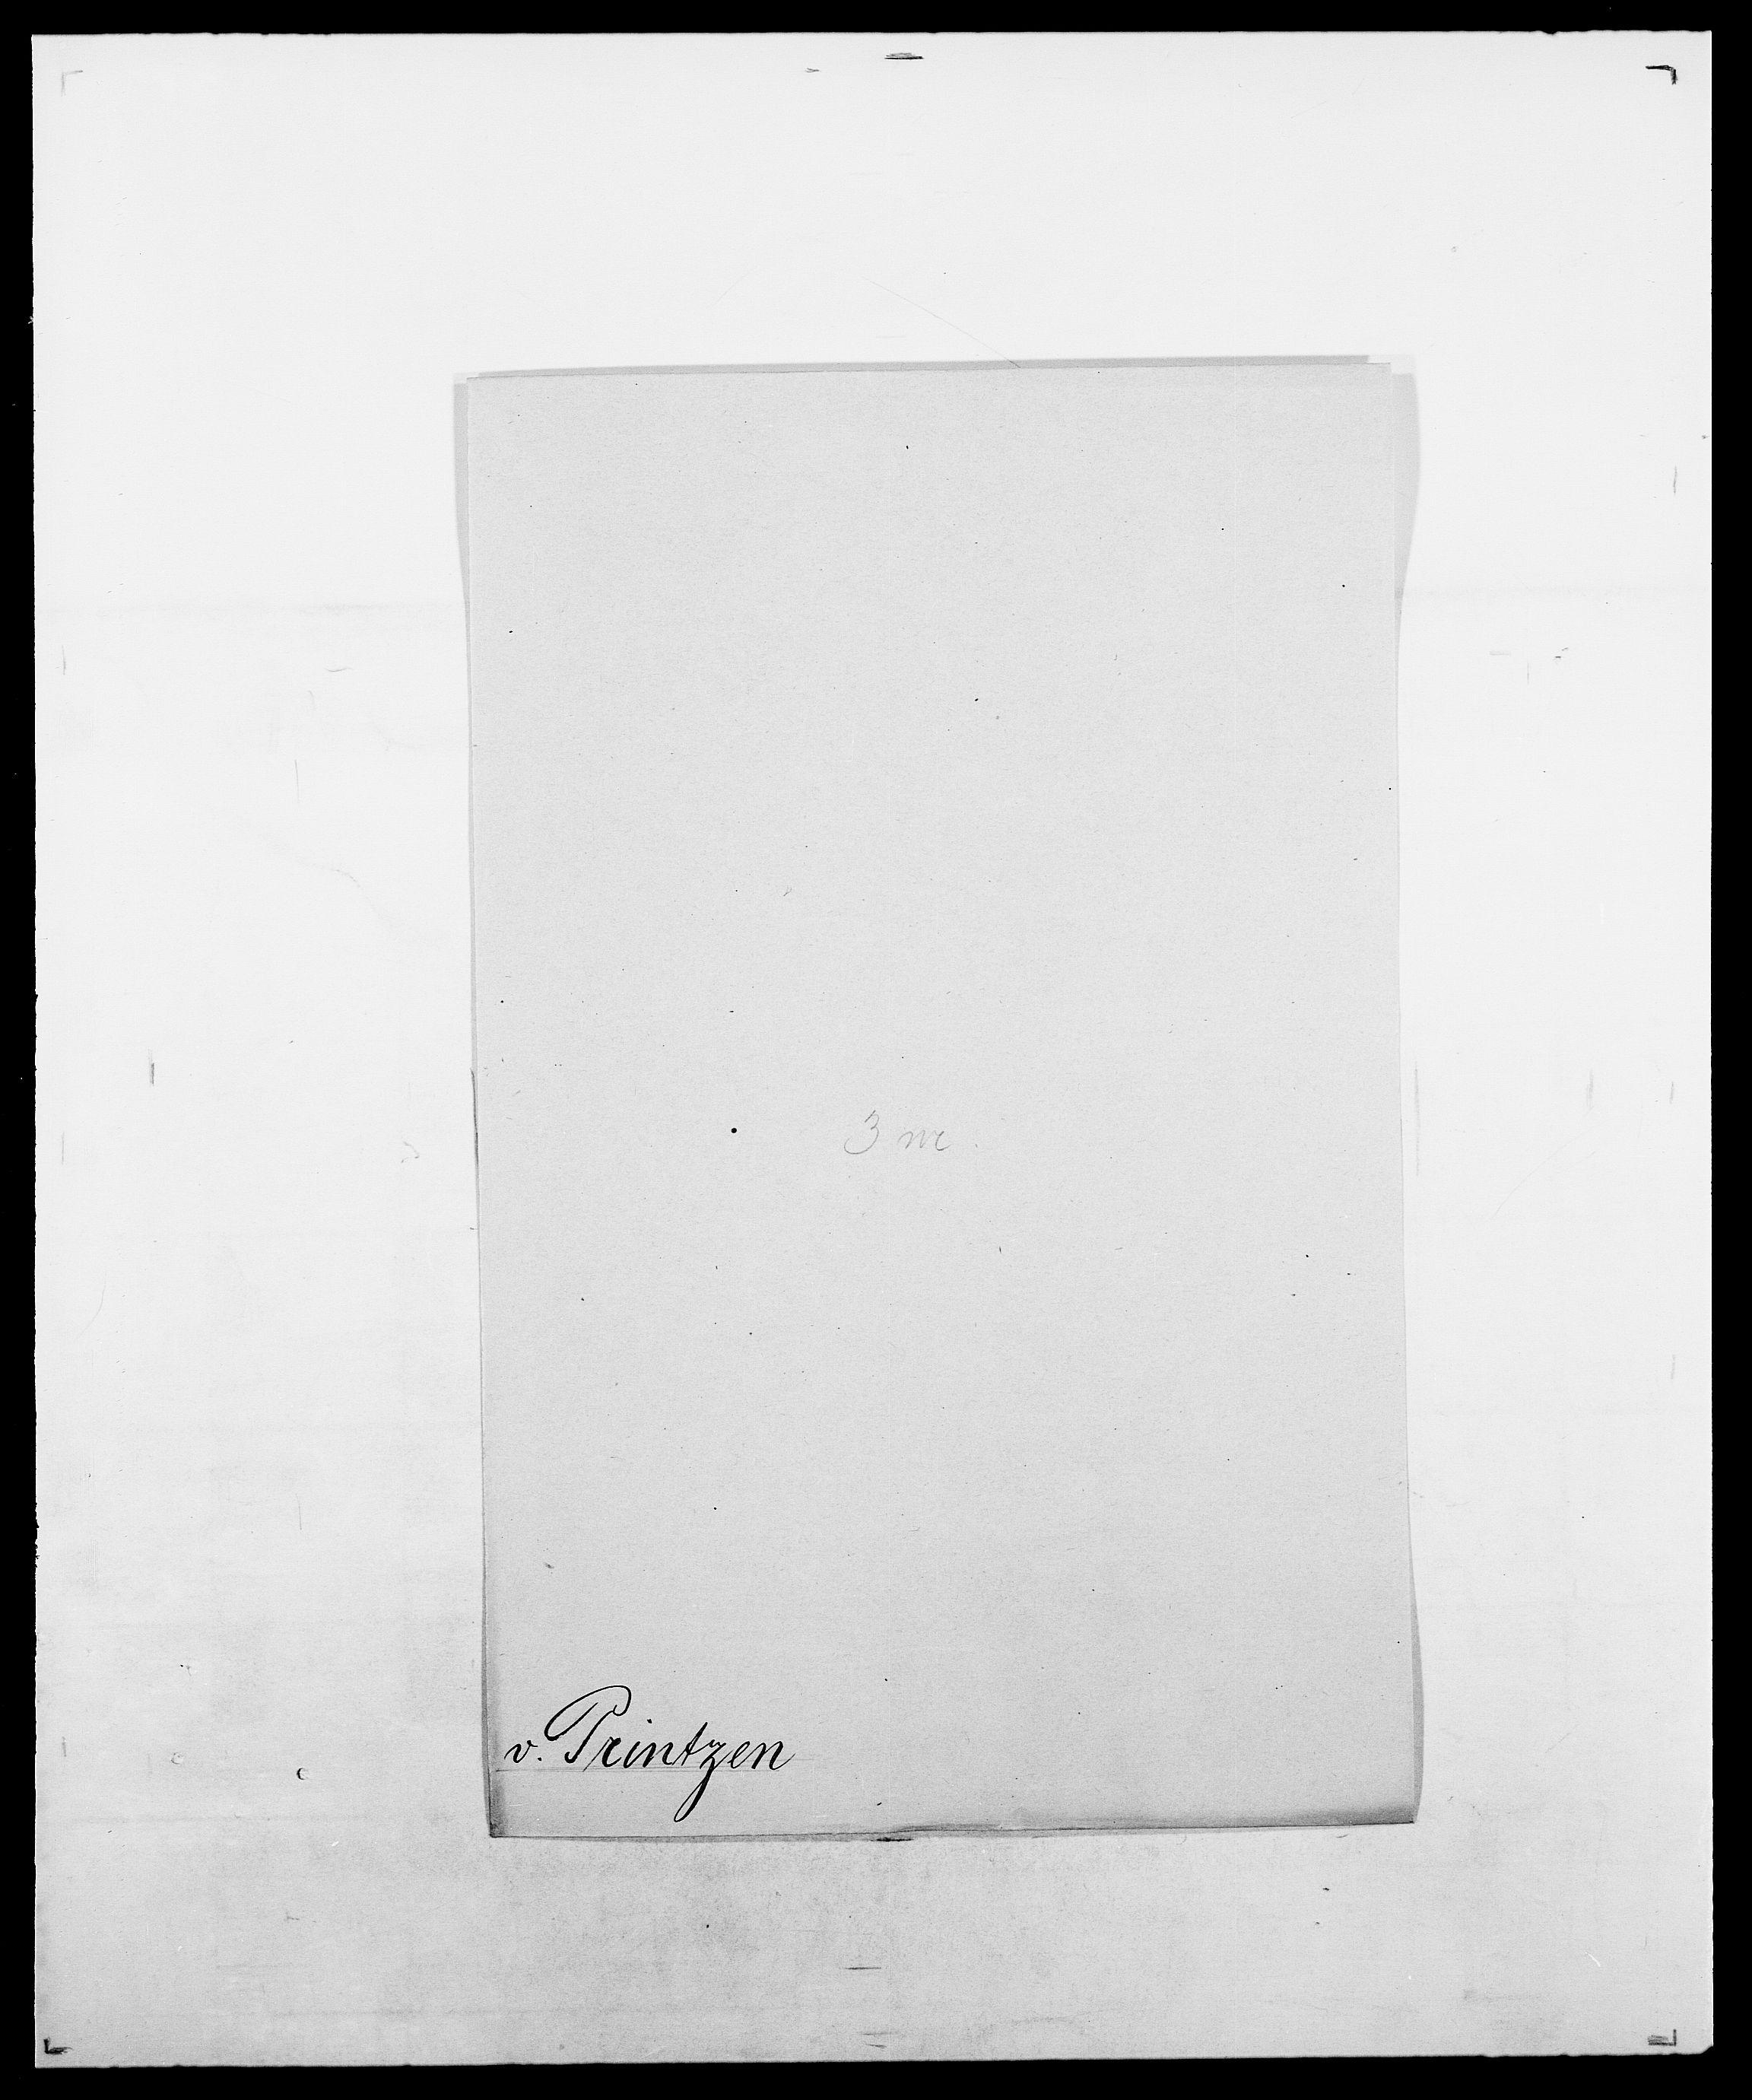 SAO, Delgobe, Charles Antoine - samling, D/Da/L0031: de Place - Raaum, s. 342